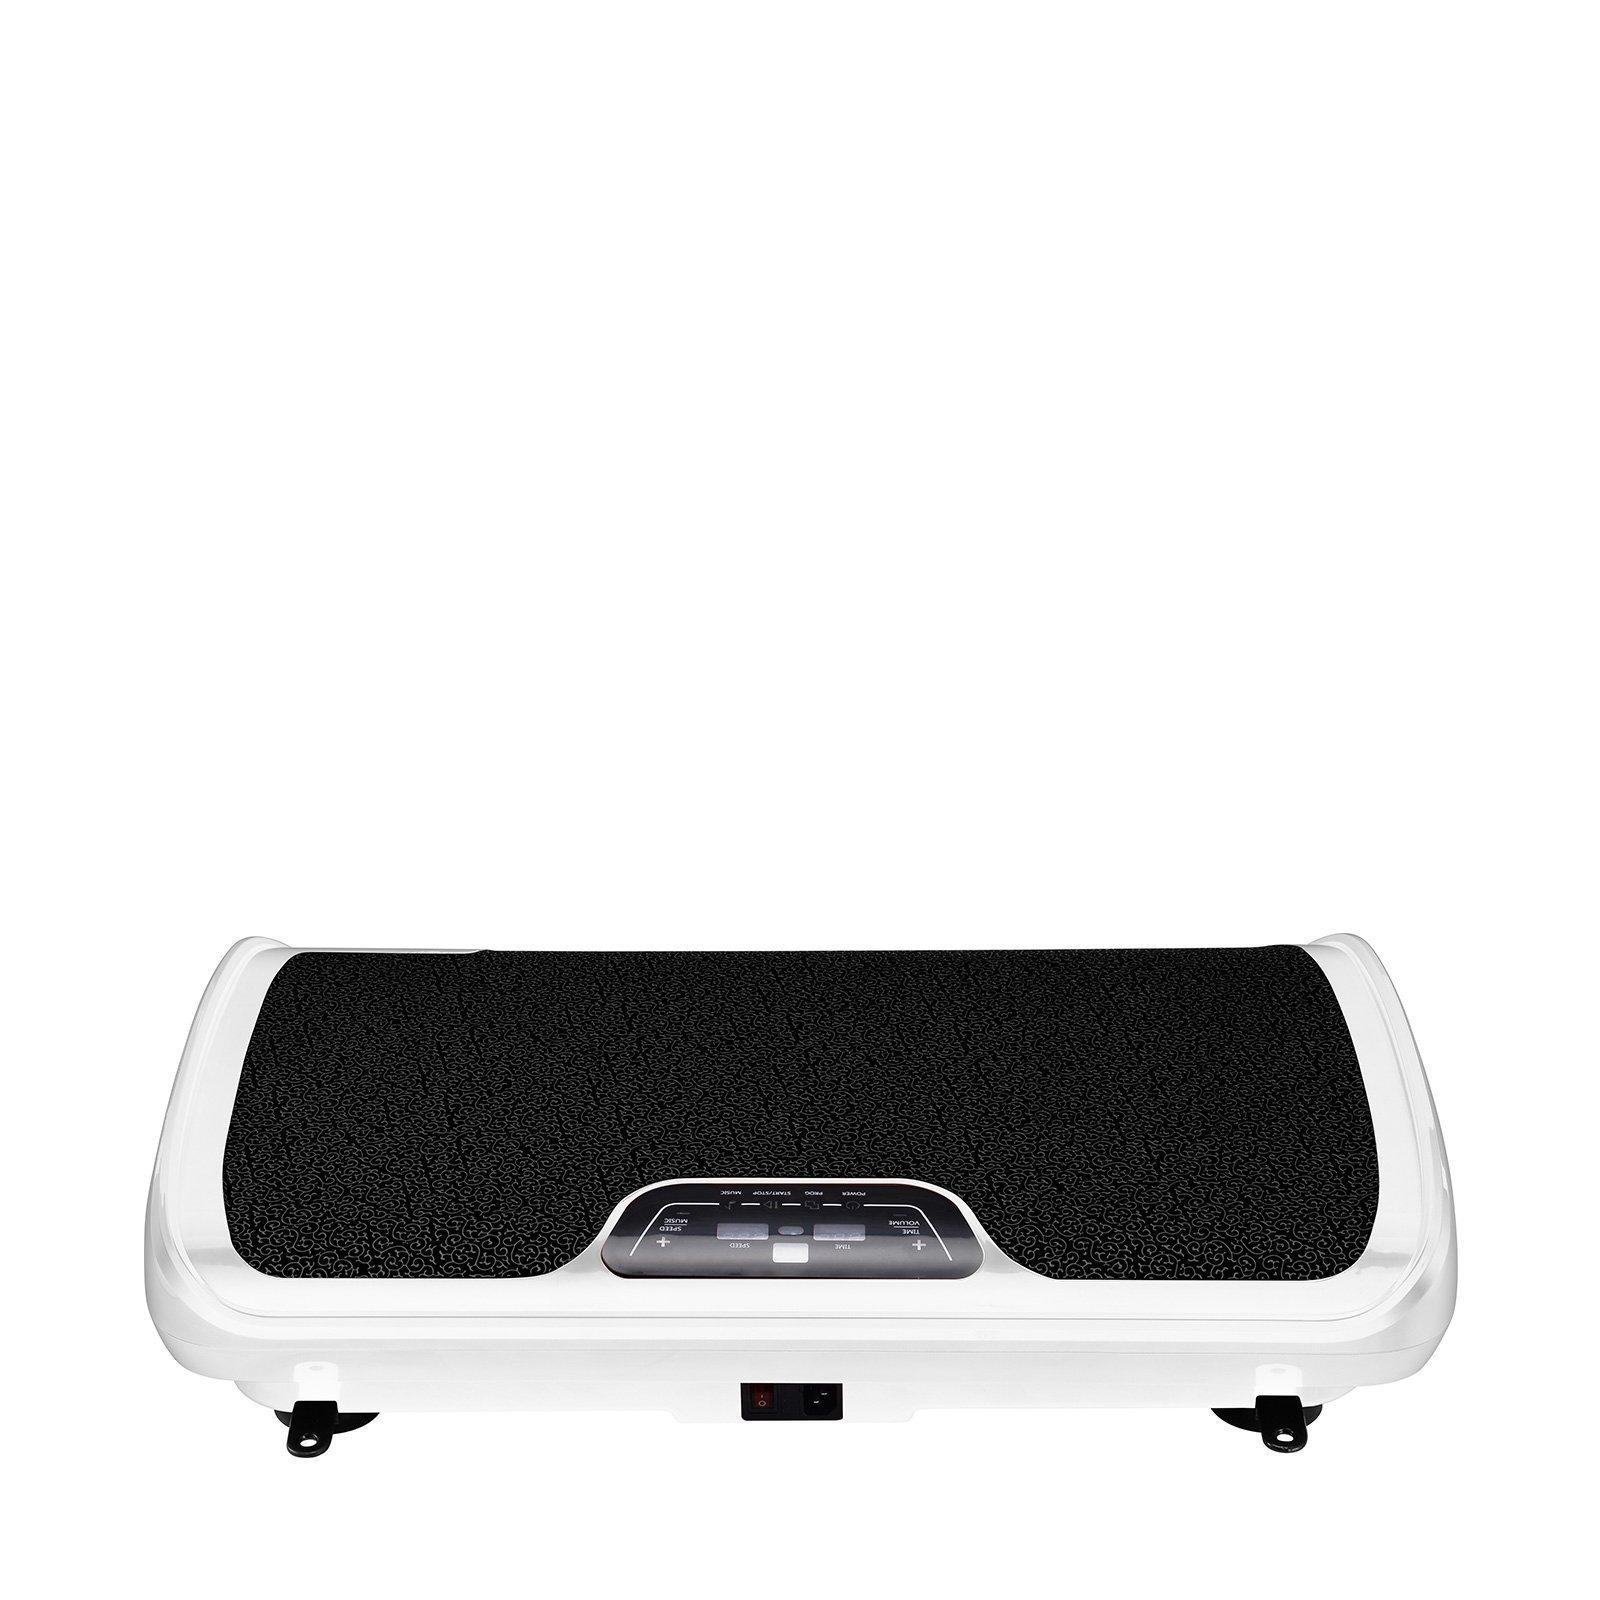 VibroSlim Tone Vibration Platform Fitness Machine, Oscillating Vibration Trainer + Free Workout DVD, Wall Chart & Resistance Bands (White)